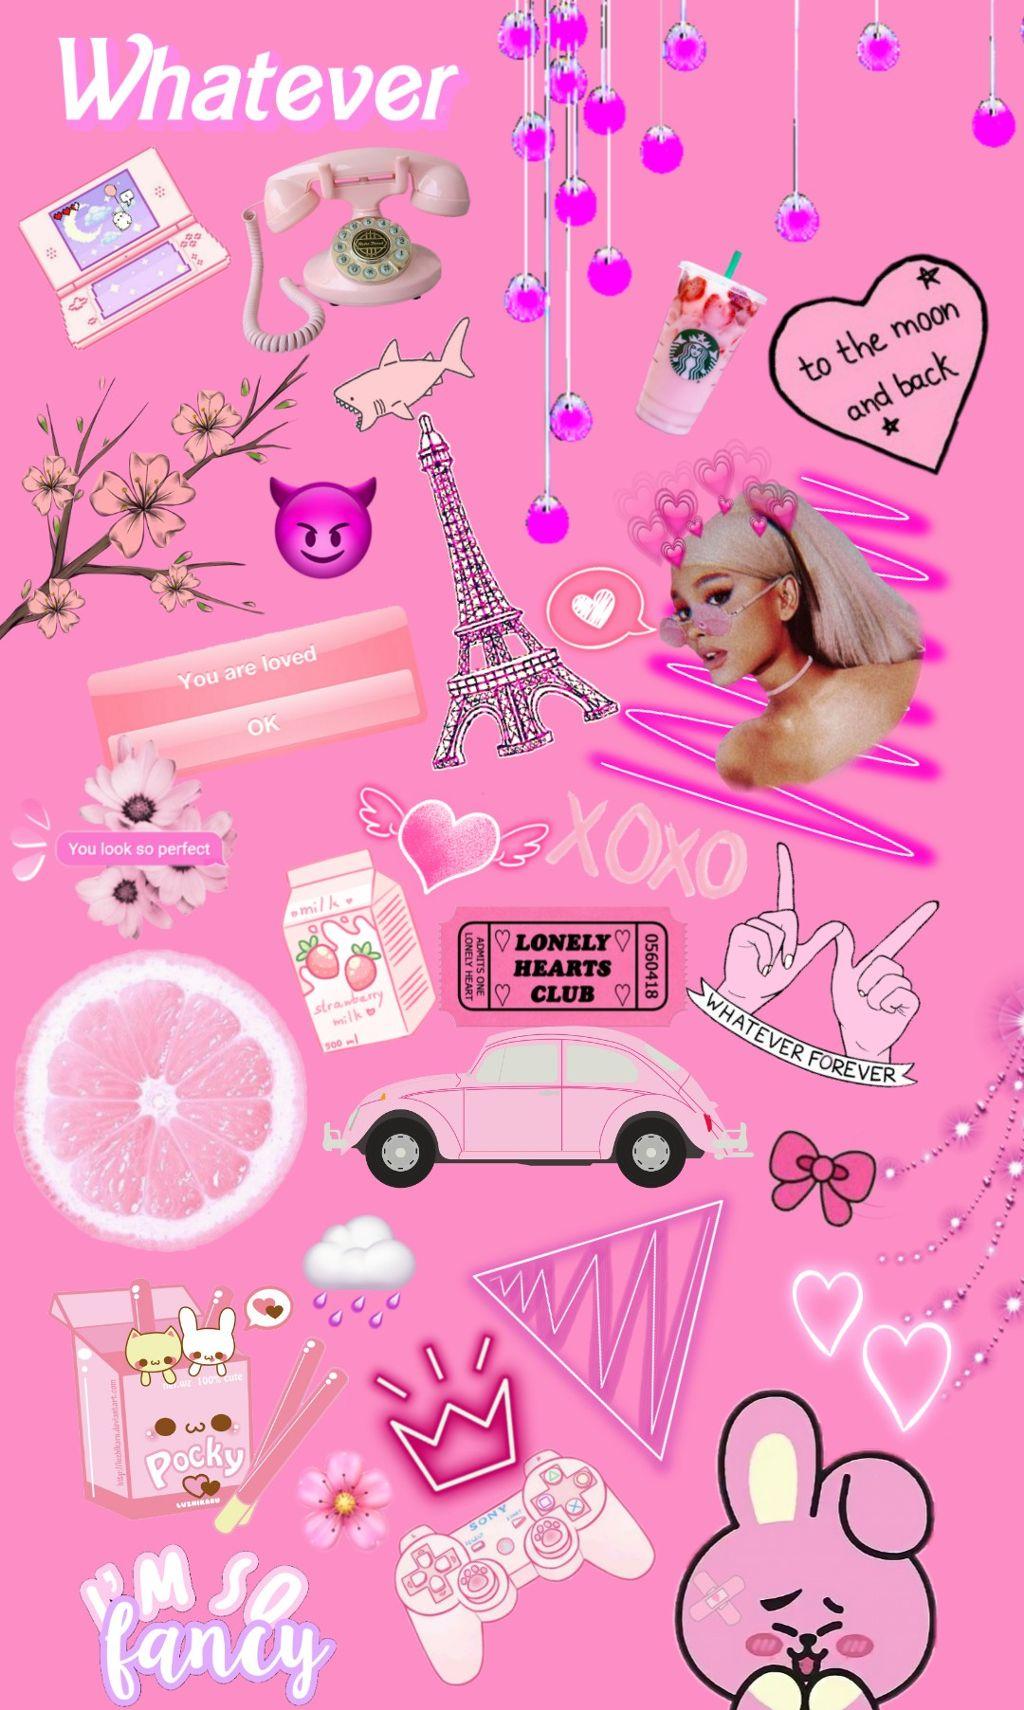 0 809 freetoedit tumblr pink background wallpaper girly collage